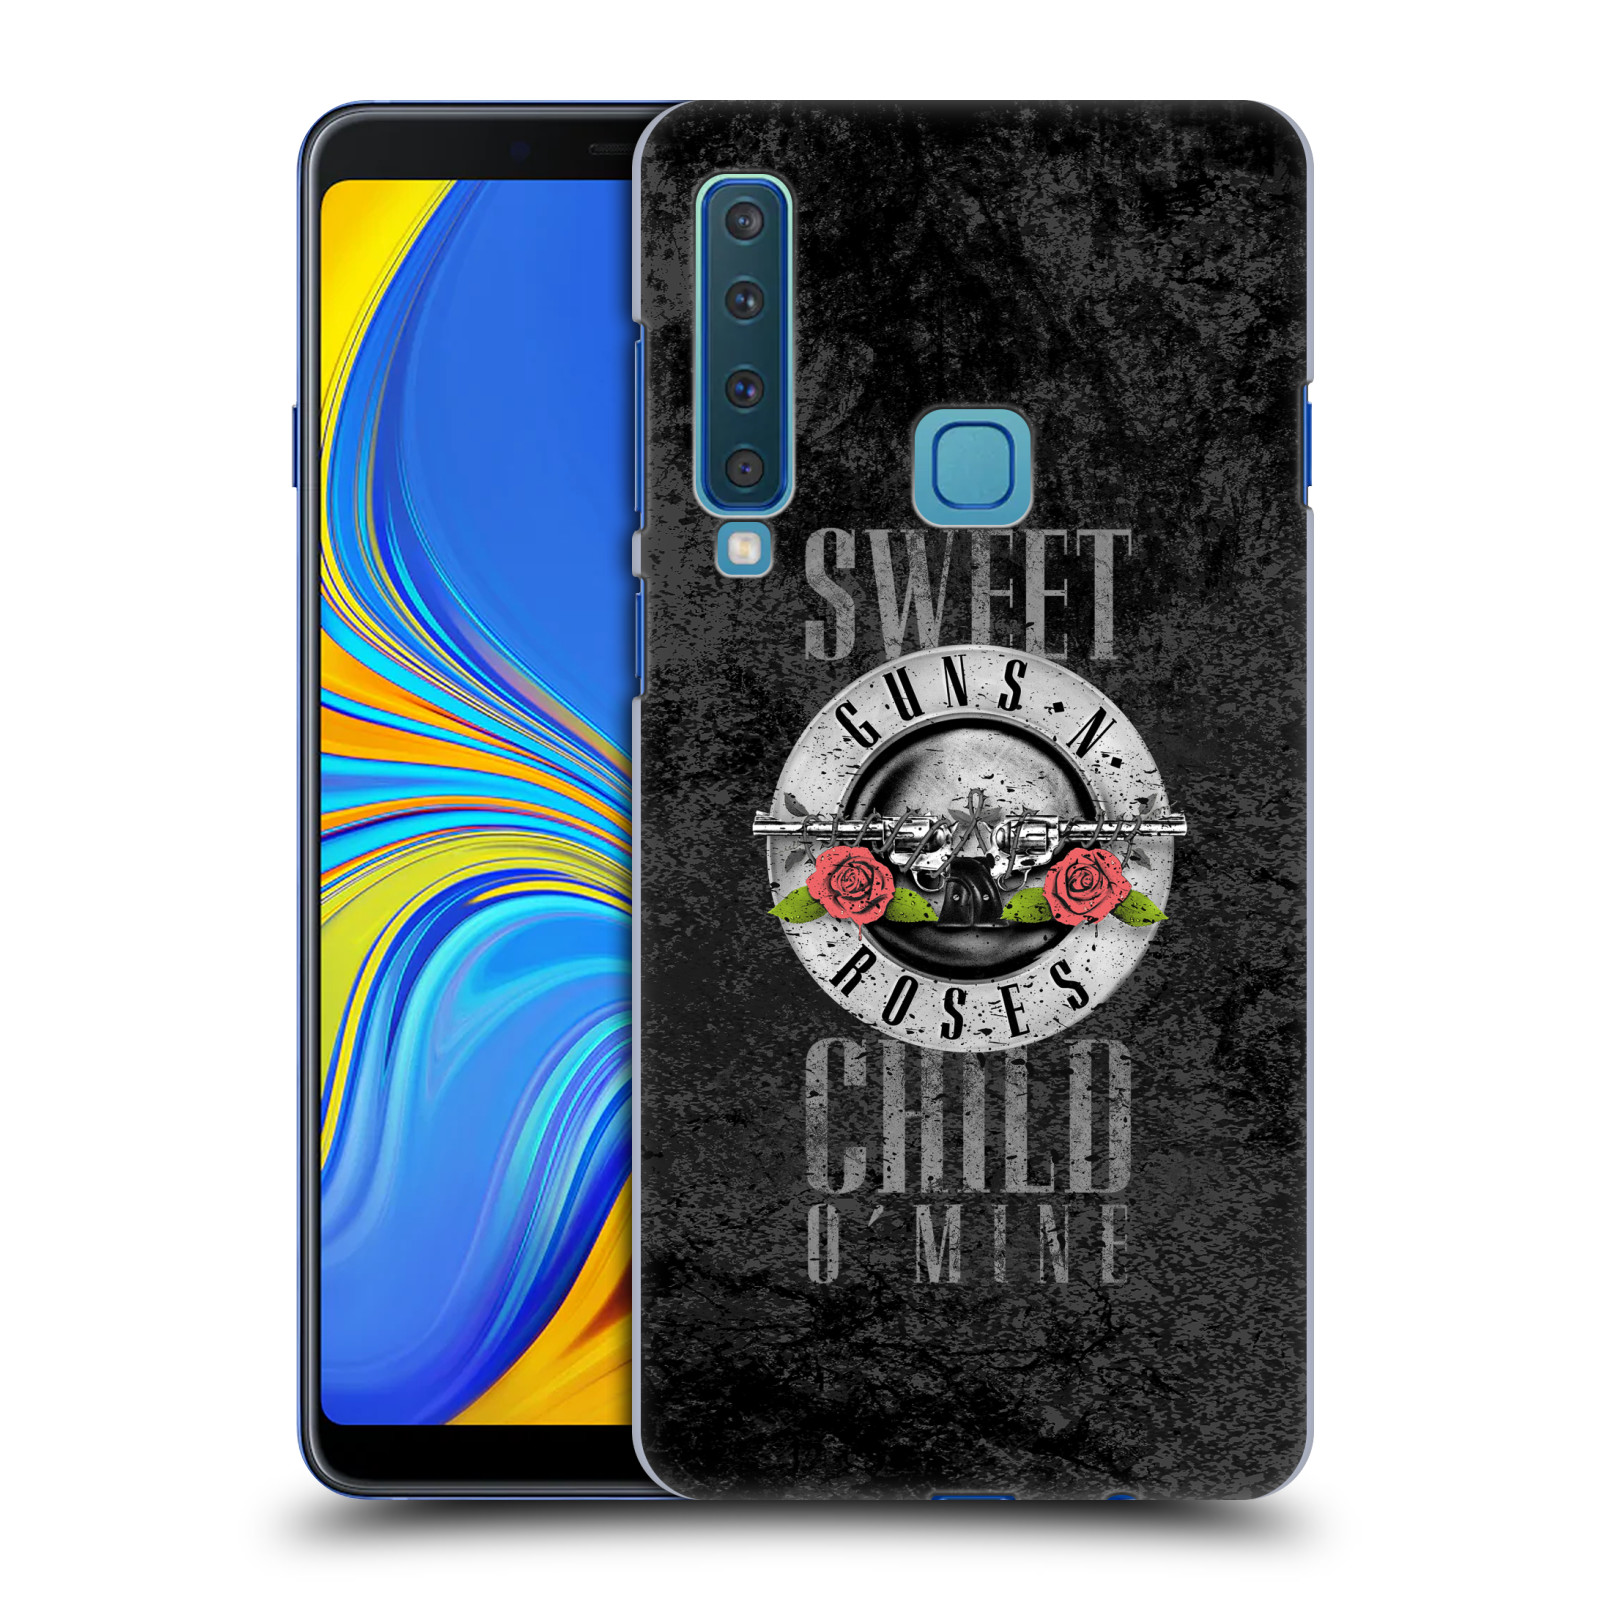 Plastové pouzdro na mobil Samsung Galaxy A9 (2018) - Head Case - Guns N' Roses - Sweet Child